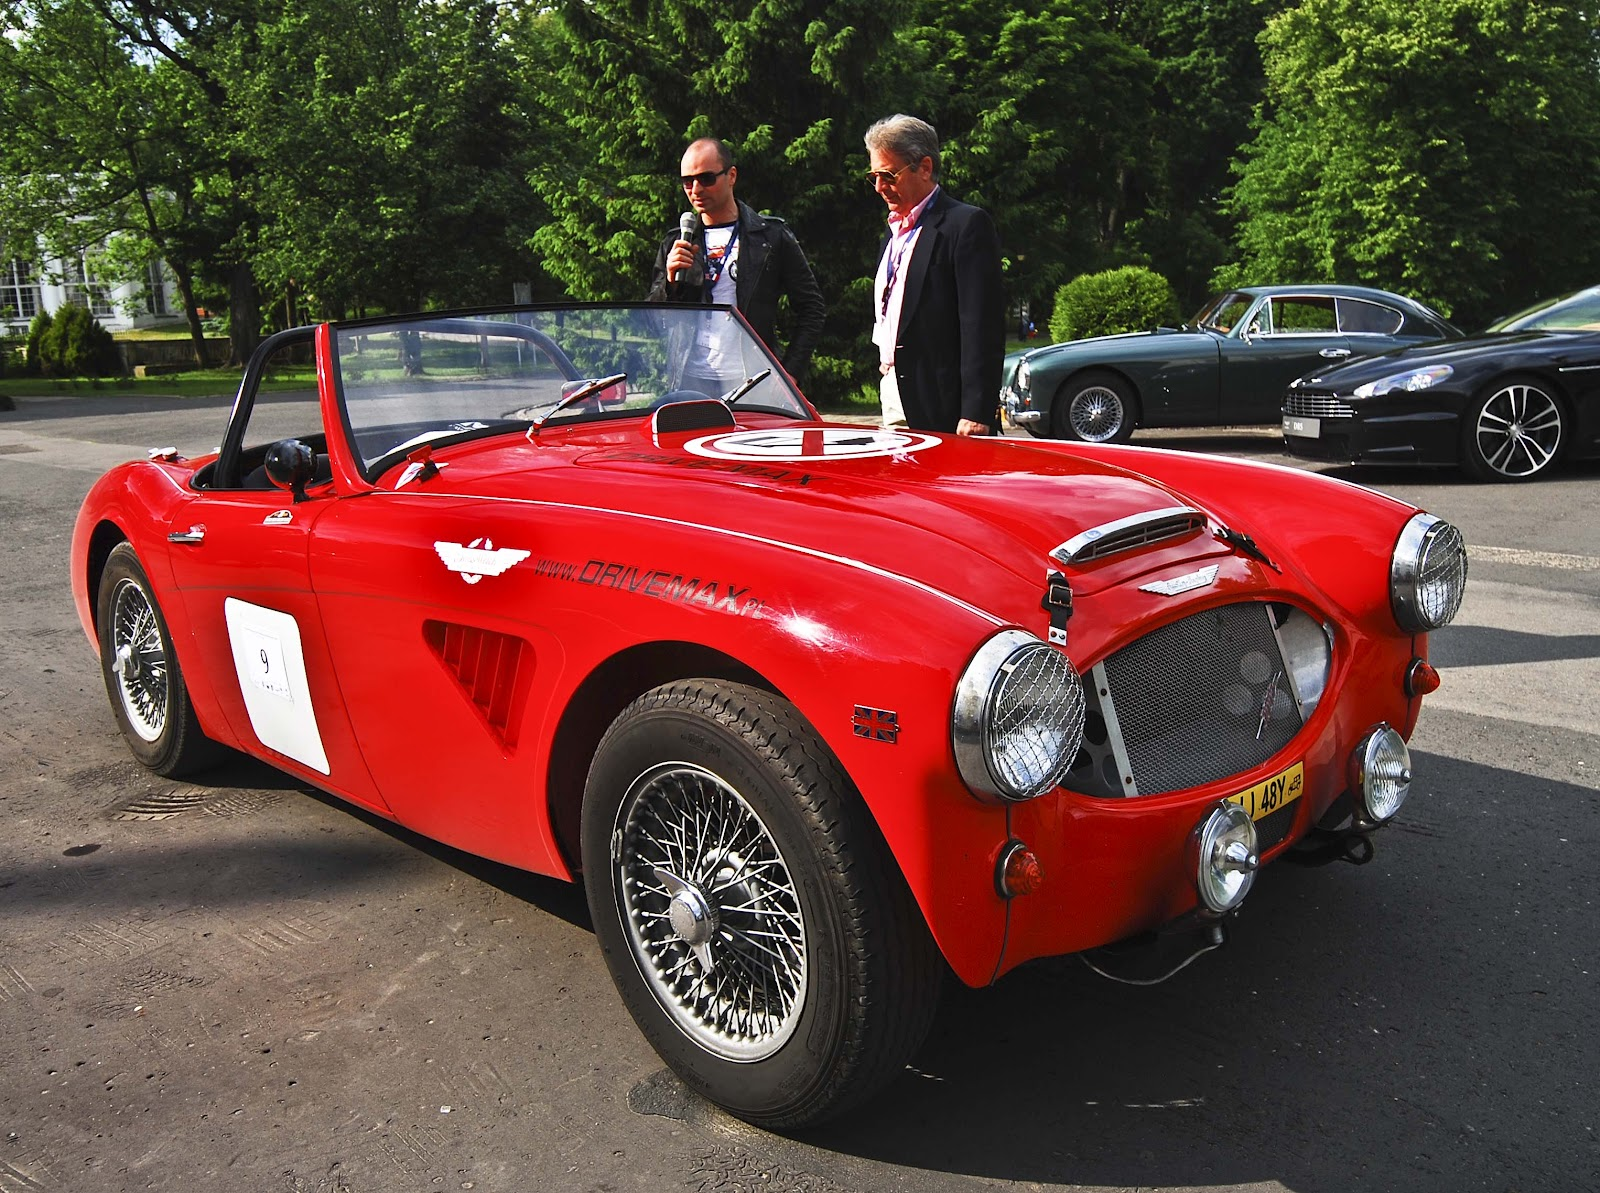 W-wa Jeziorki: Classic British cars - Jabłonna